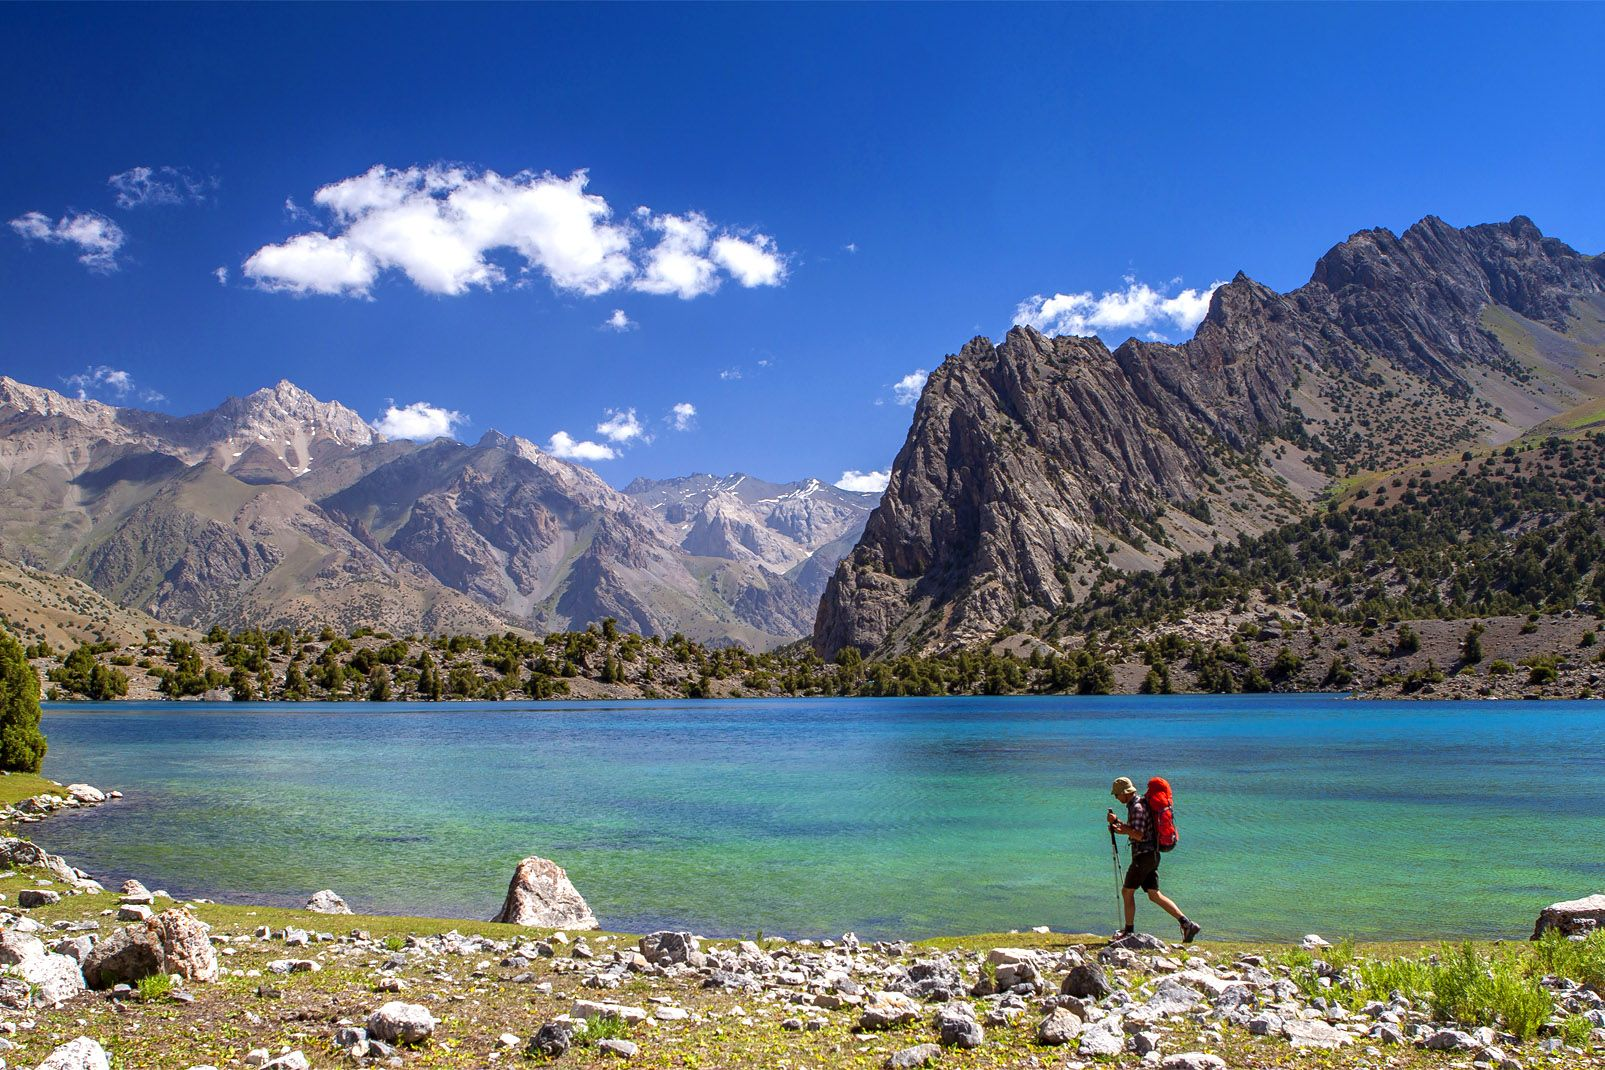 Tagikistan,